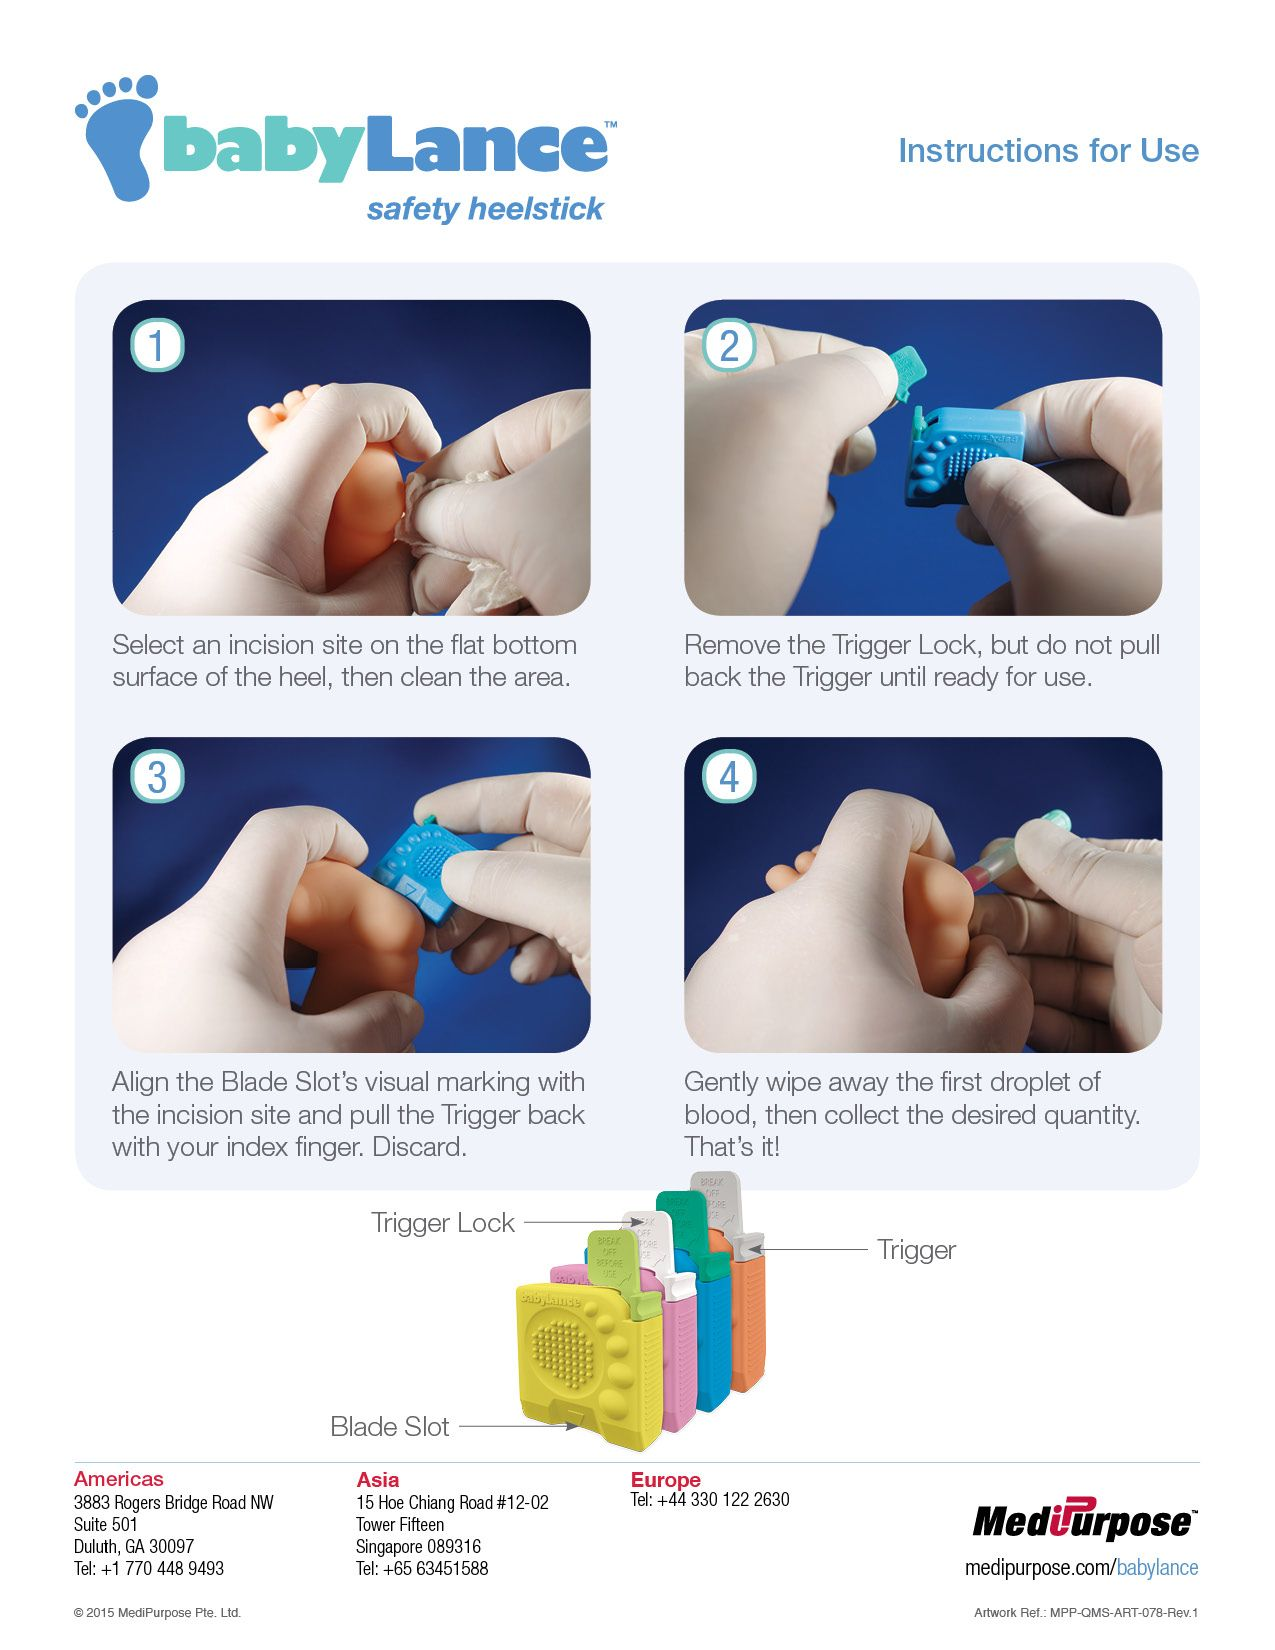 babyLance™ Safety Heelstick User Guide - RUDNAK communications